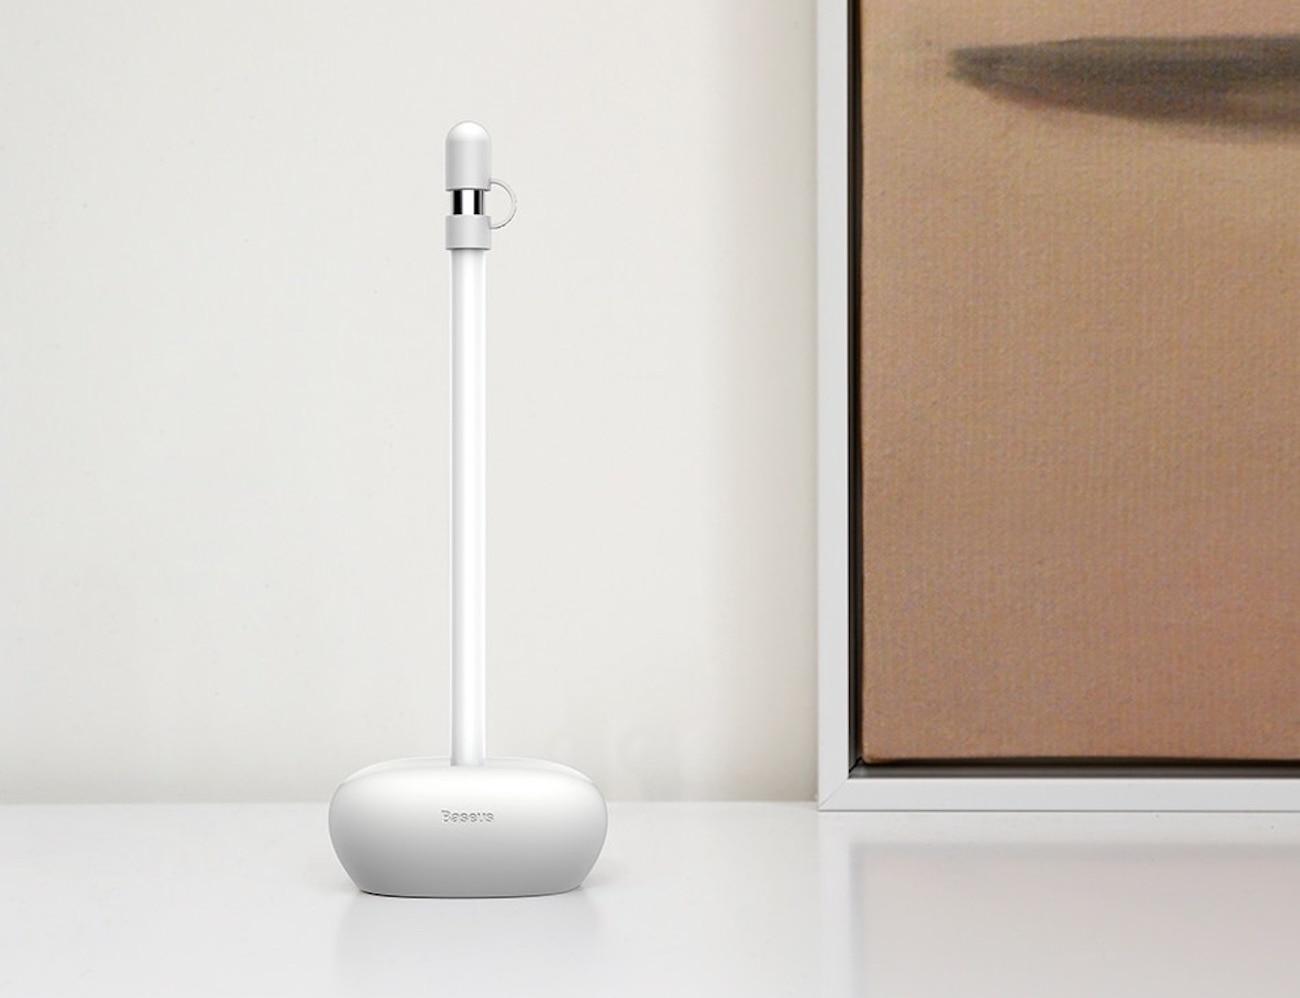 Silicone Apple Pencil Holder